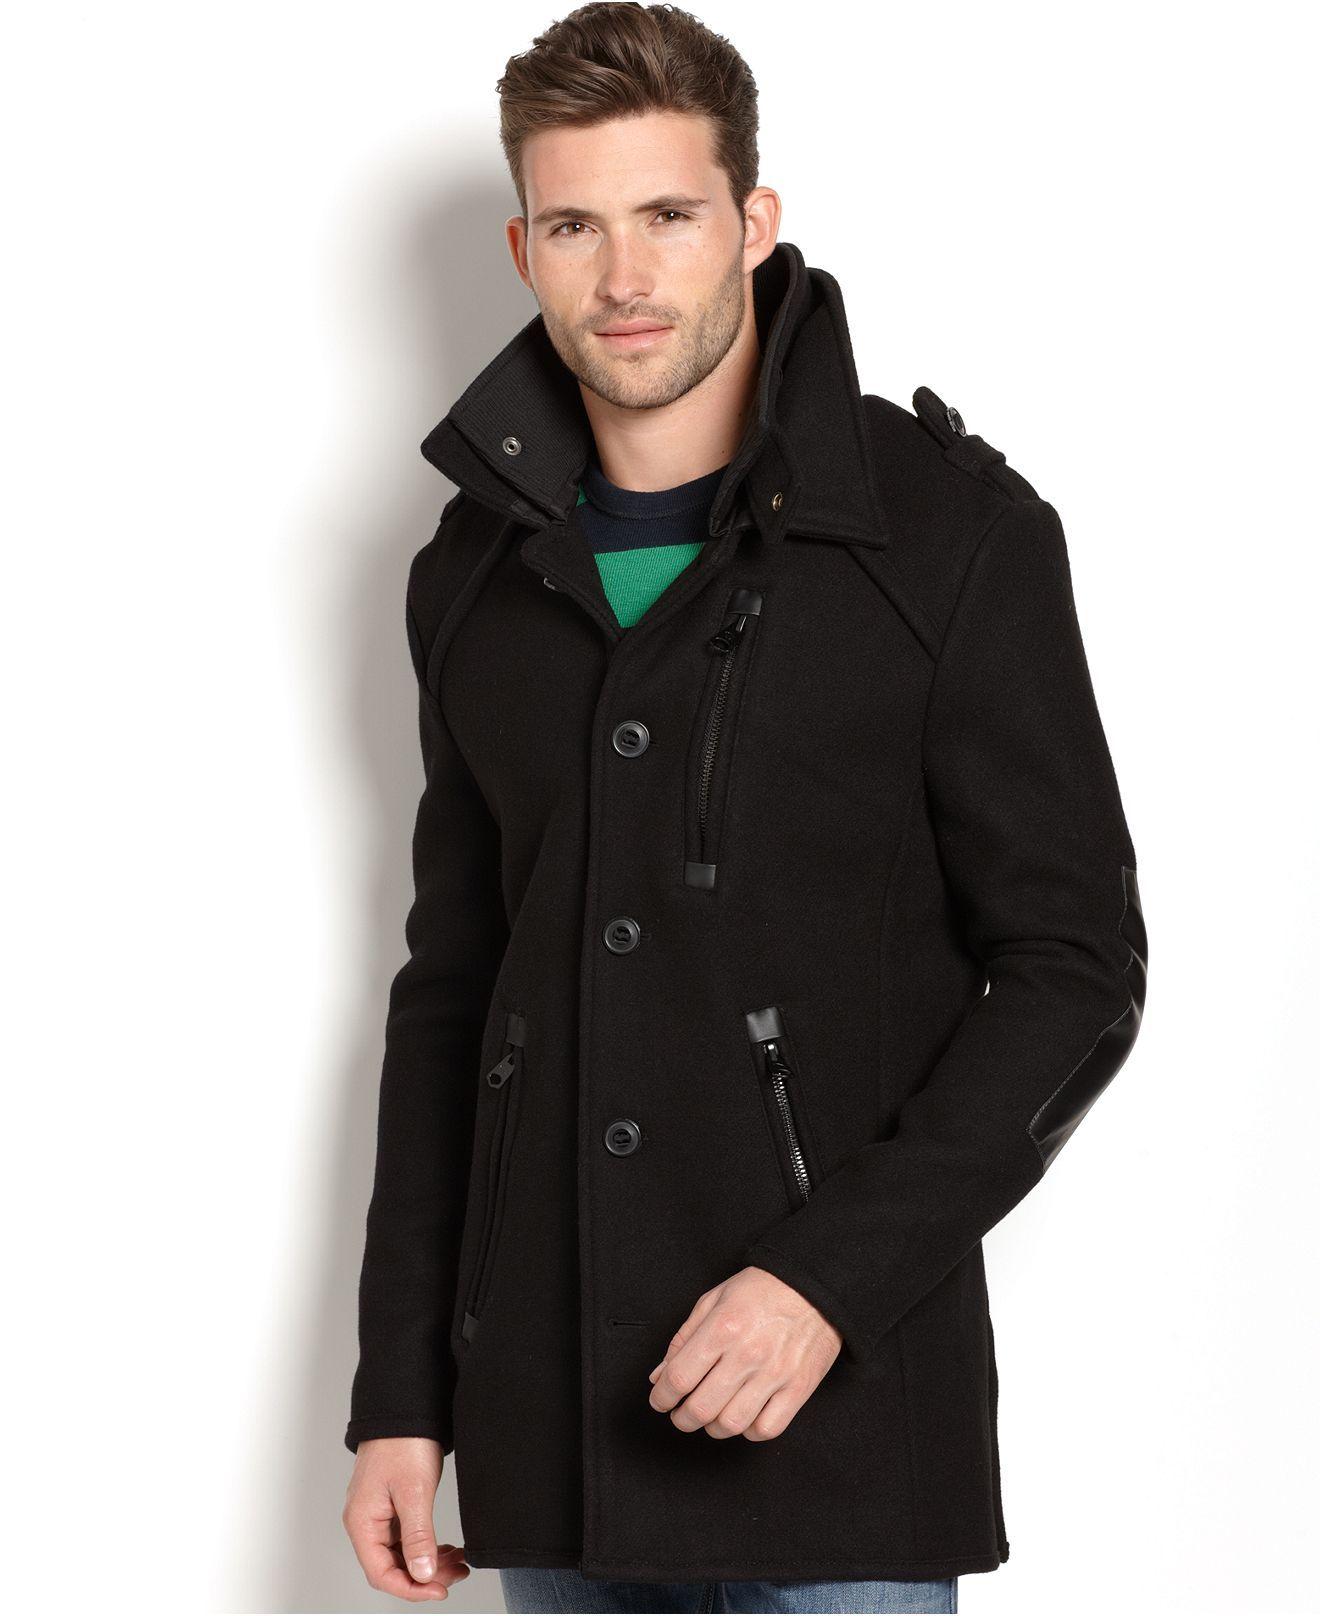 Buffalo David Bitton Jacket Janney Button Front Jacket Mens Coats Jackets Macy S Mens Fur Coat Jackets Mens Jackets [ 1616 x 1320 Pixel ]